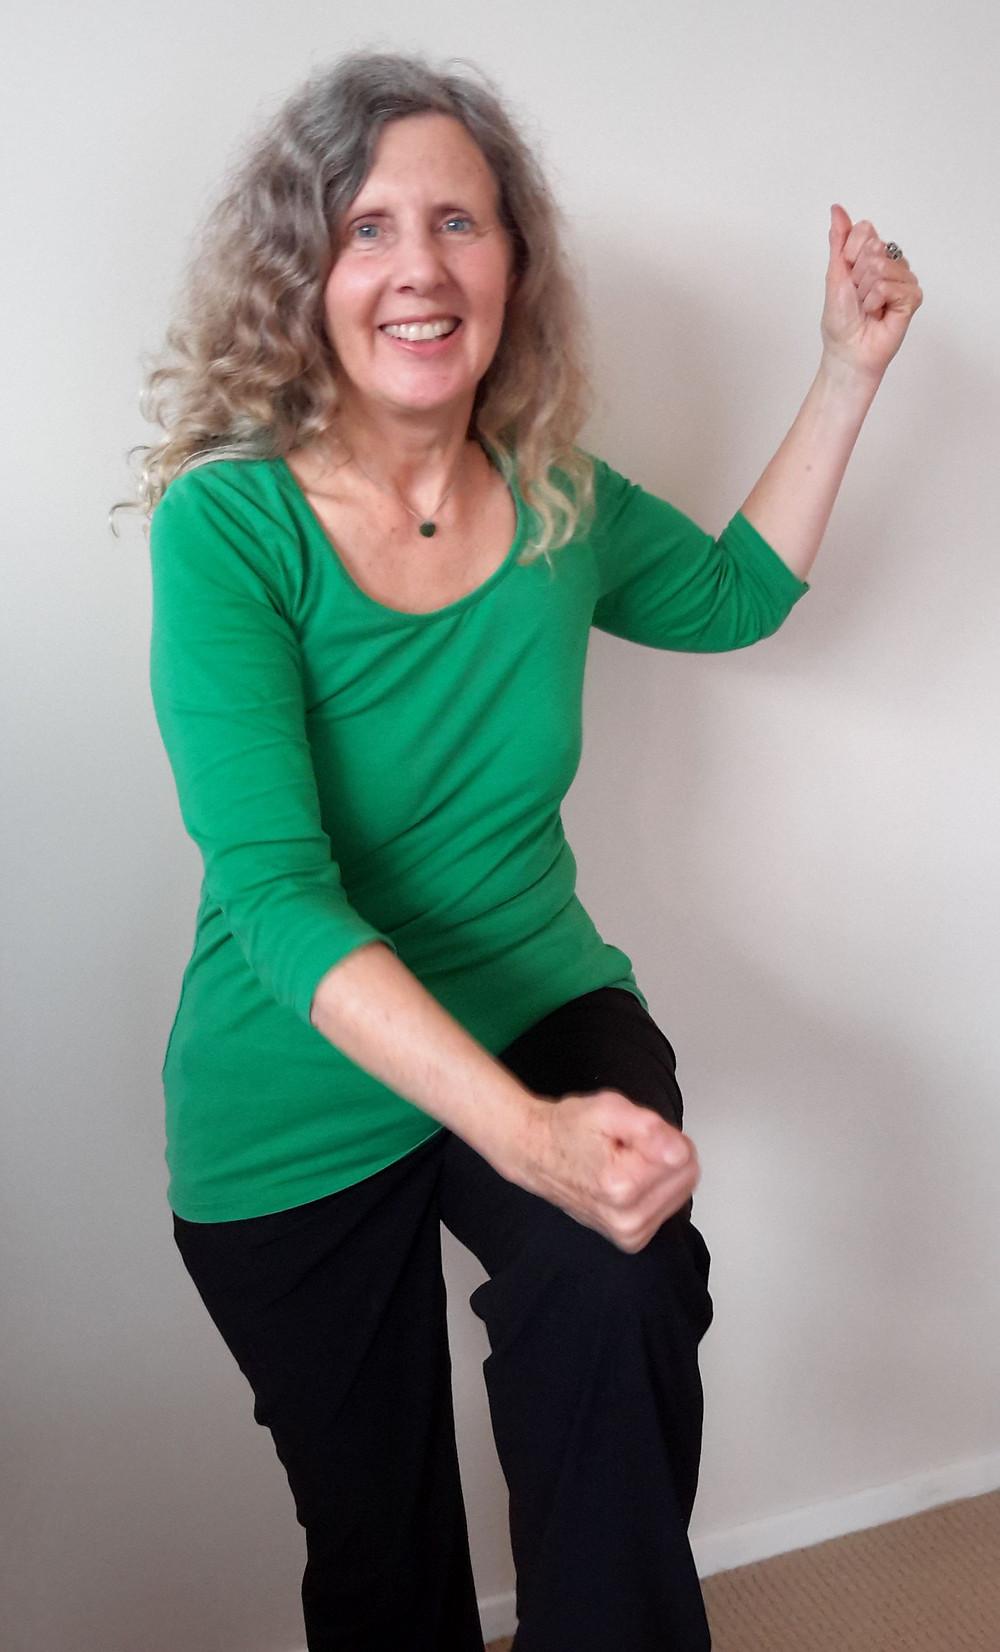 Glenys Earle doing energy medicine Cross Crawl to enhance energy